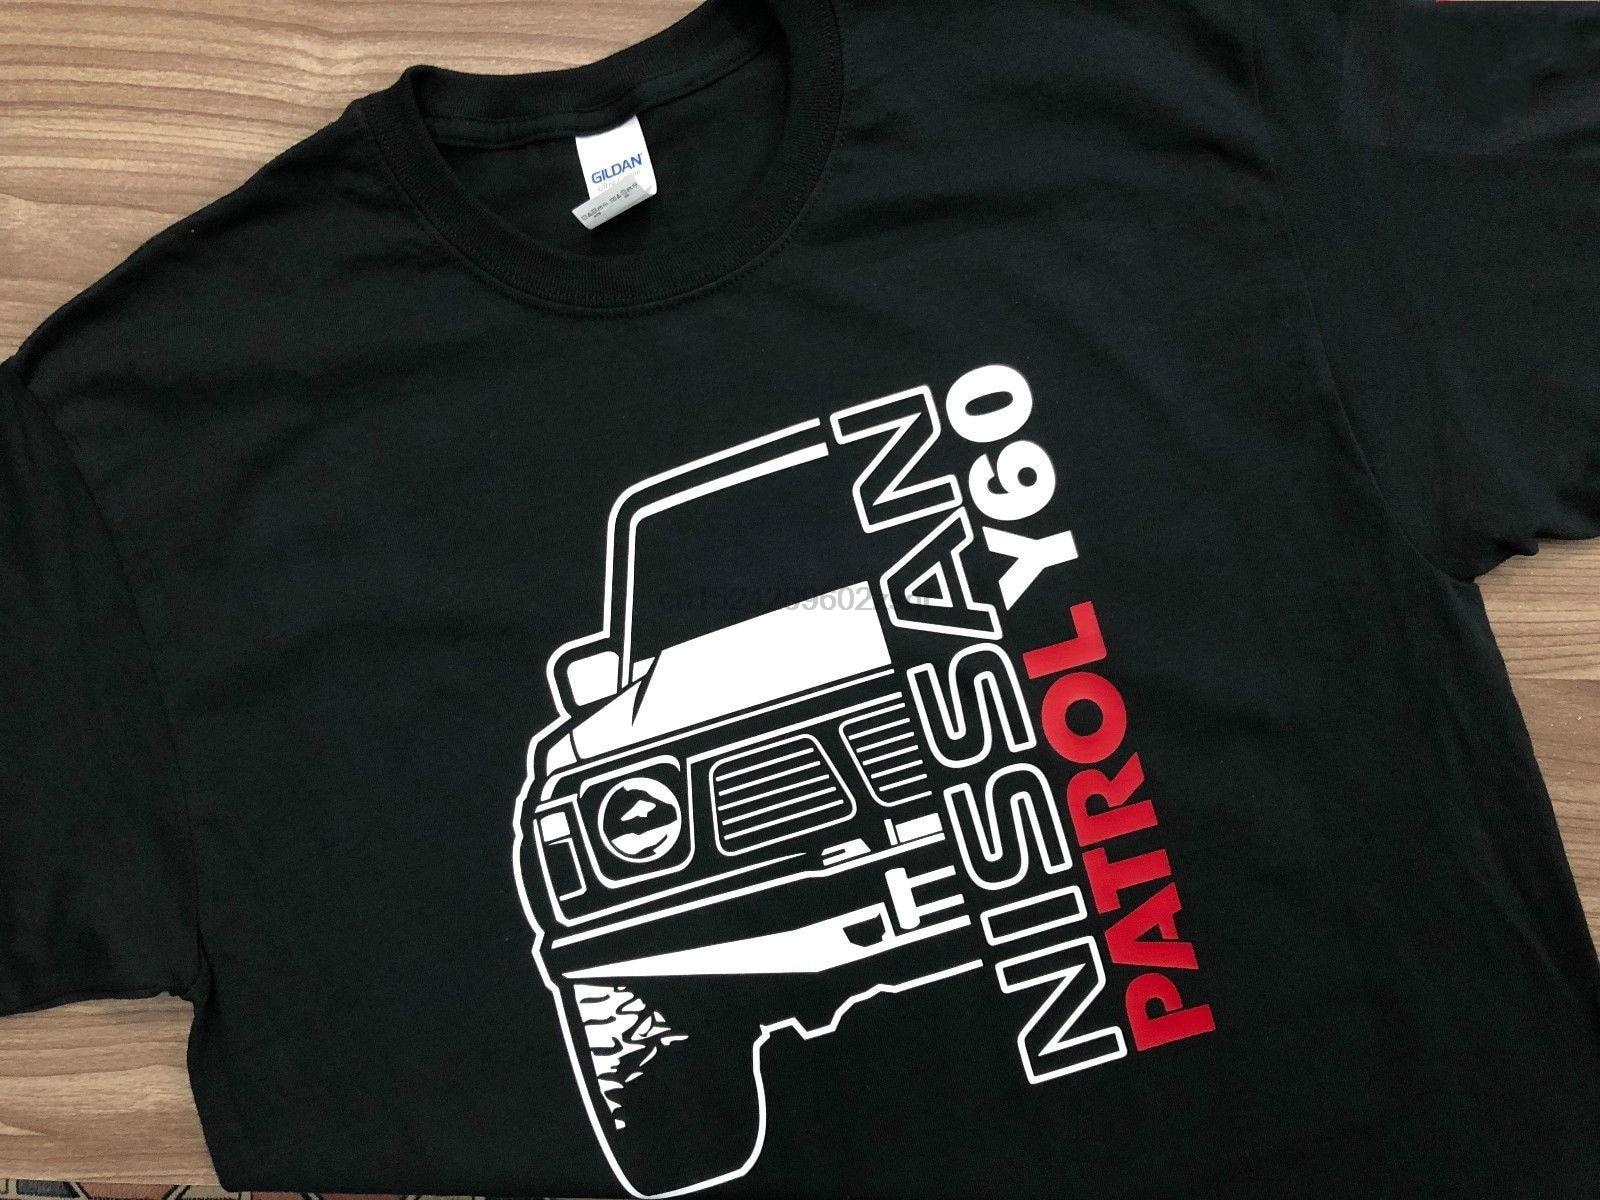 1 Be Novel In Design Nissan Patrol Premium Mens T-shirt Fashion Tee Shirt Casual Funny Tops Clothing